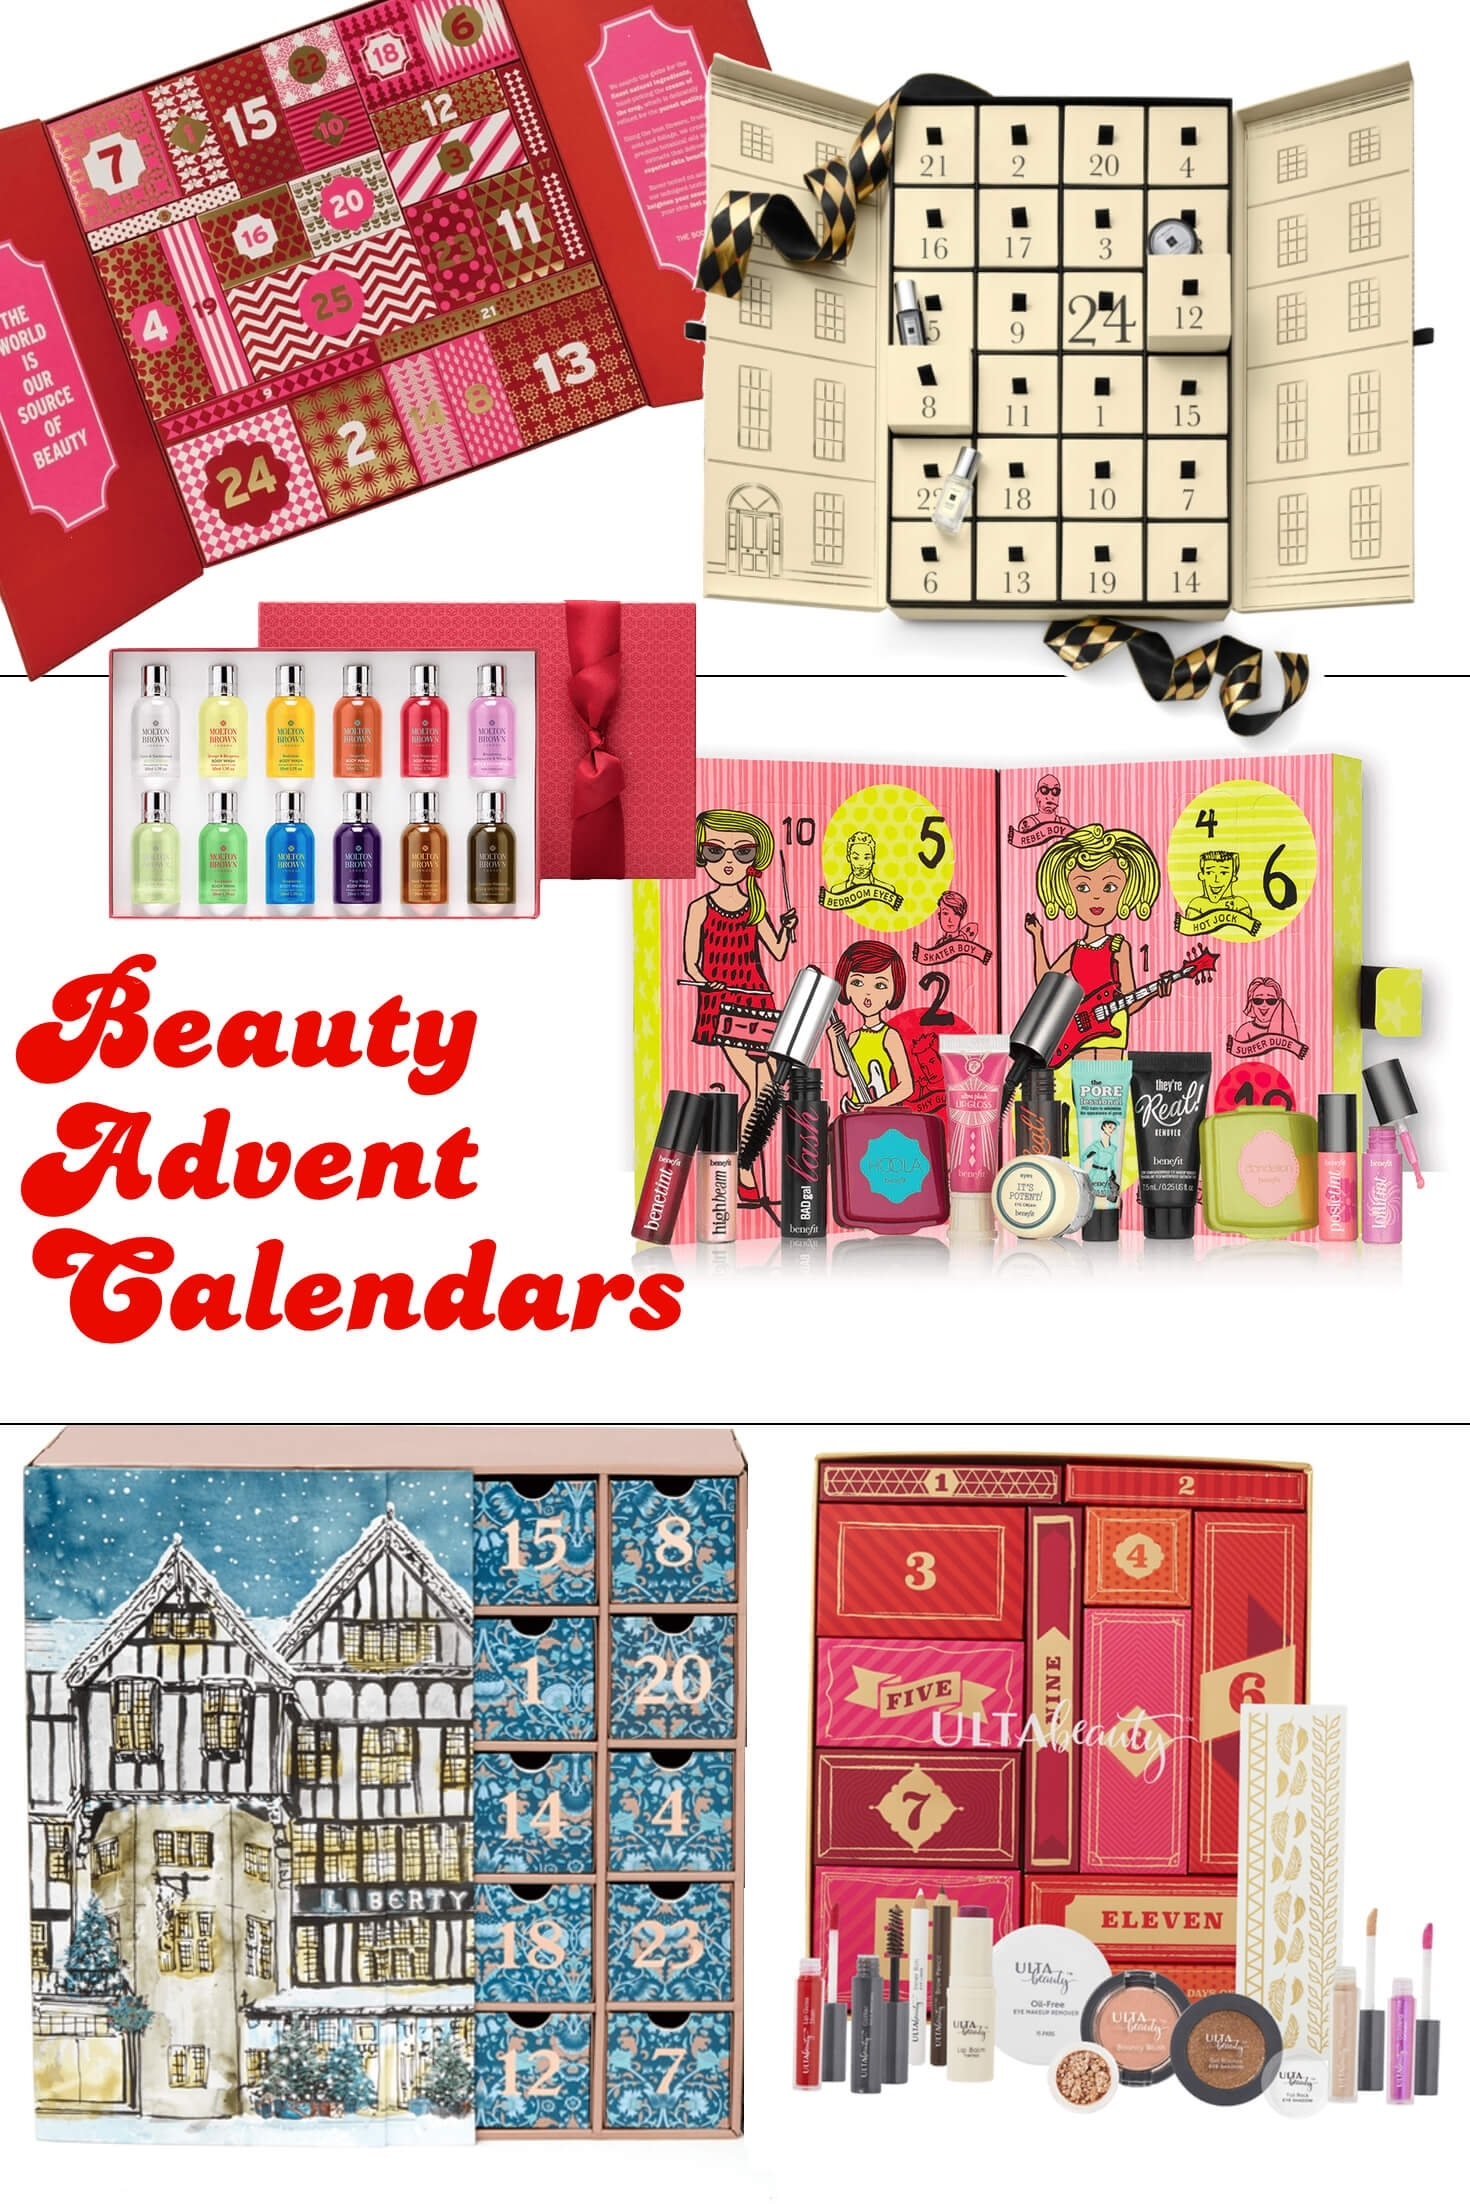 Best Beauty Advent Calendars 2020! - Hello Subscription